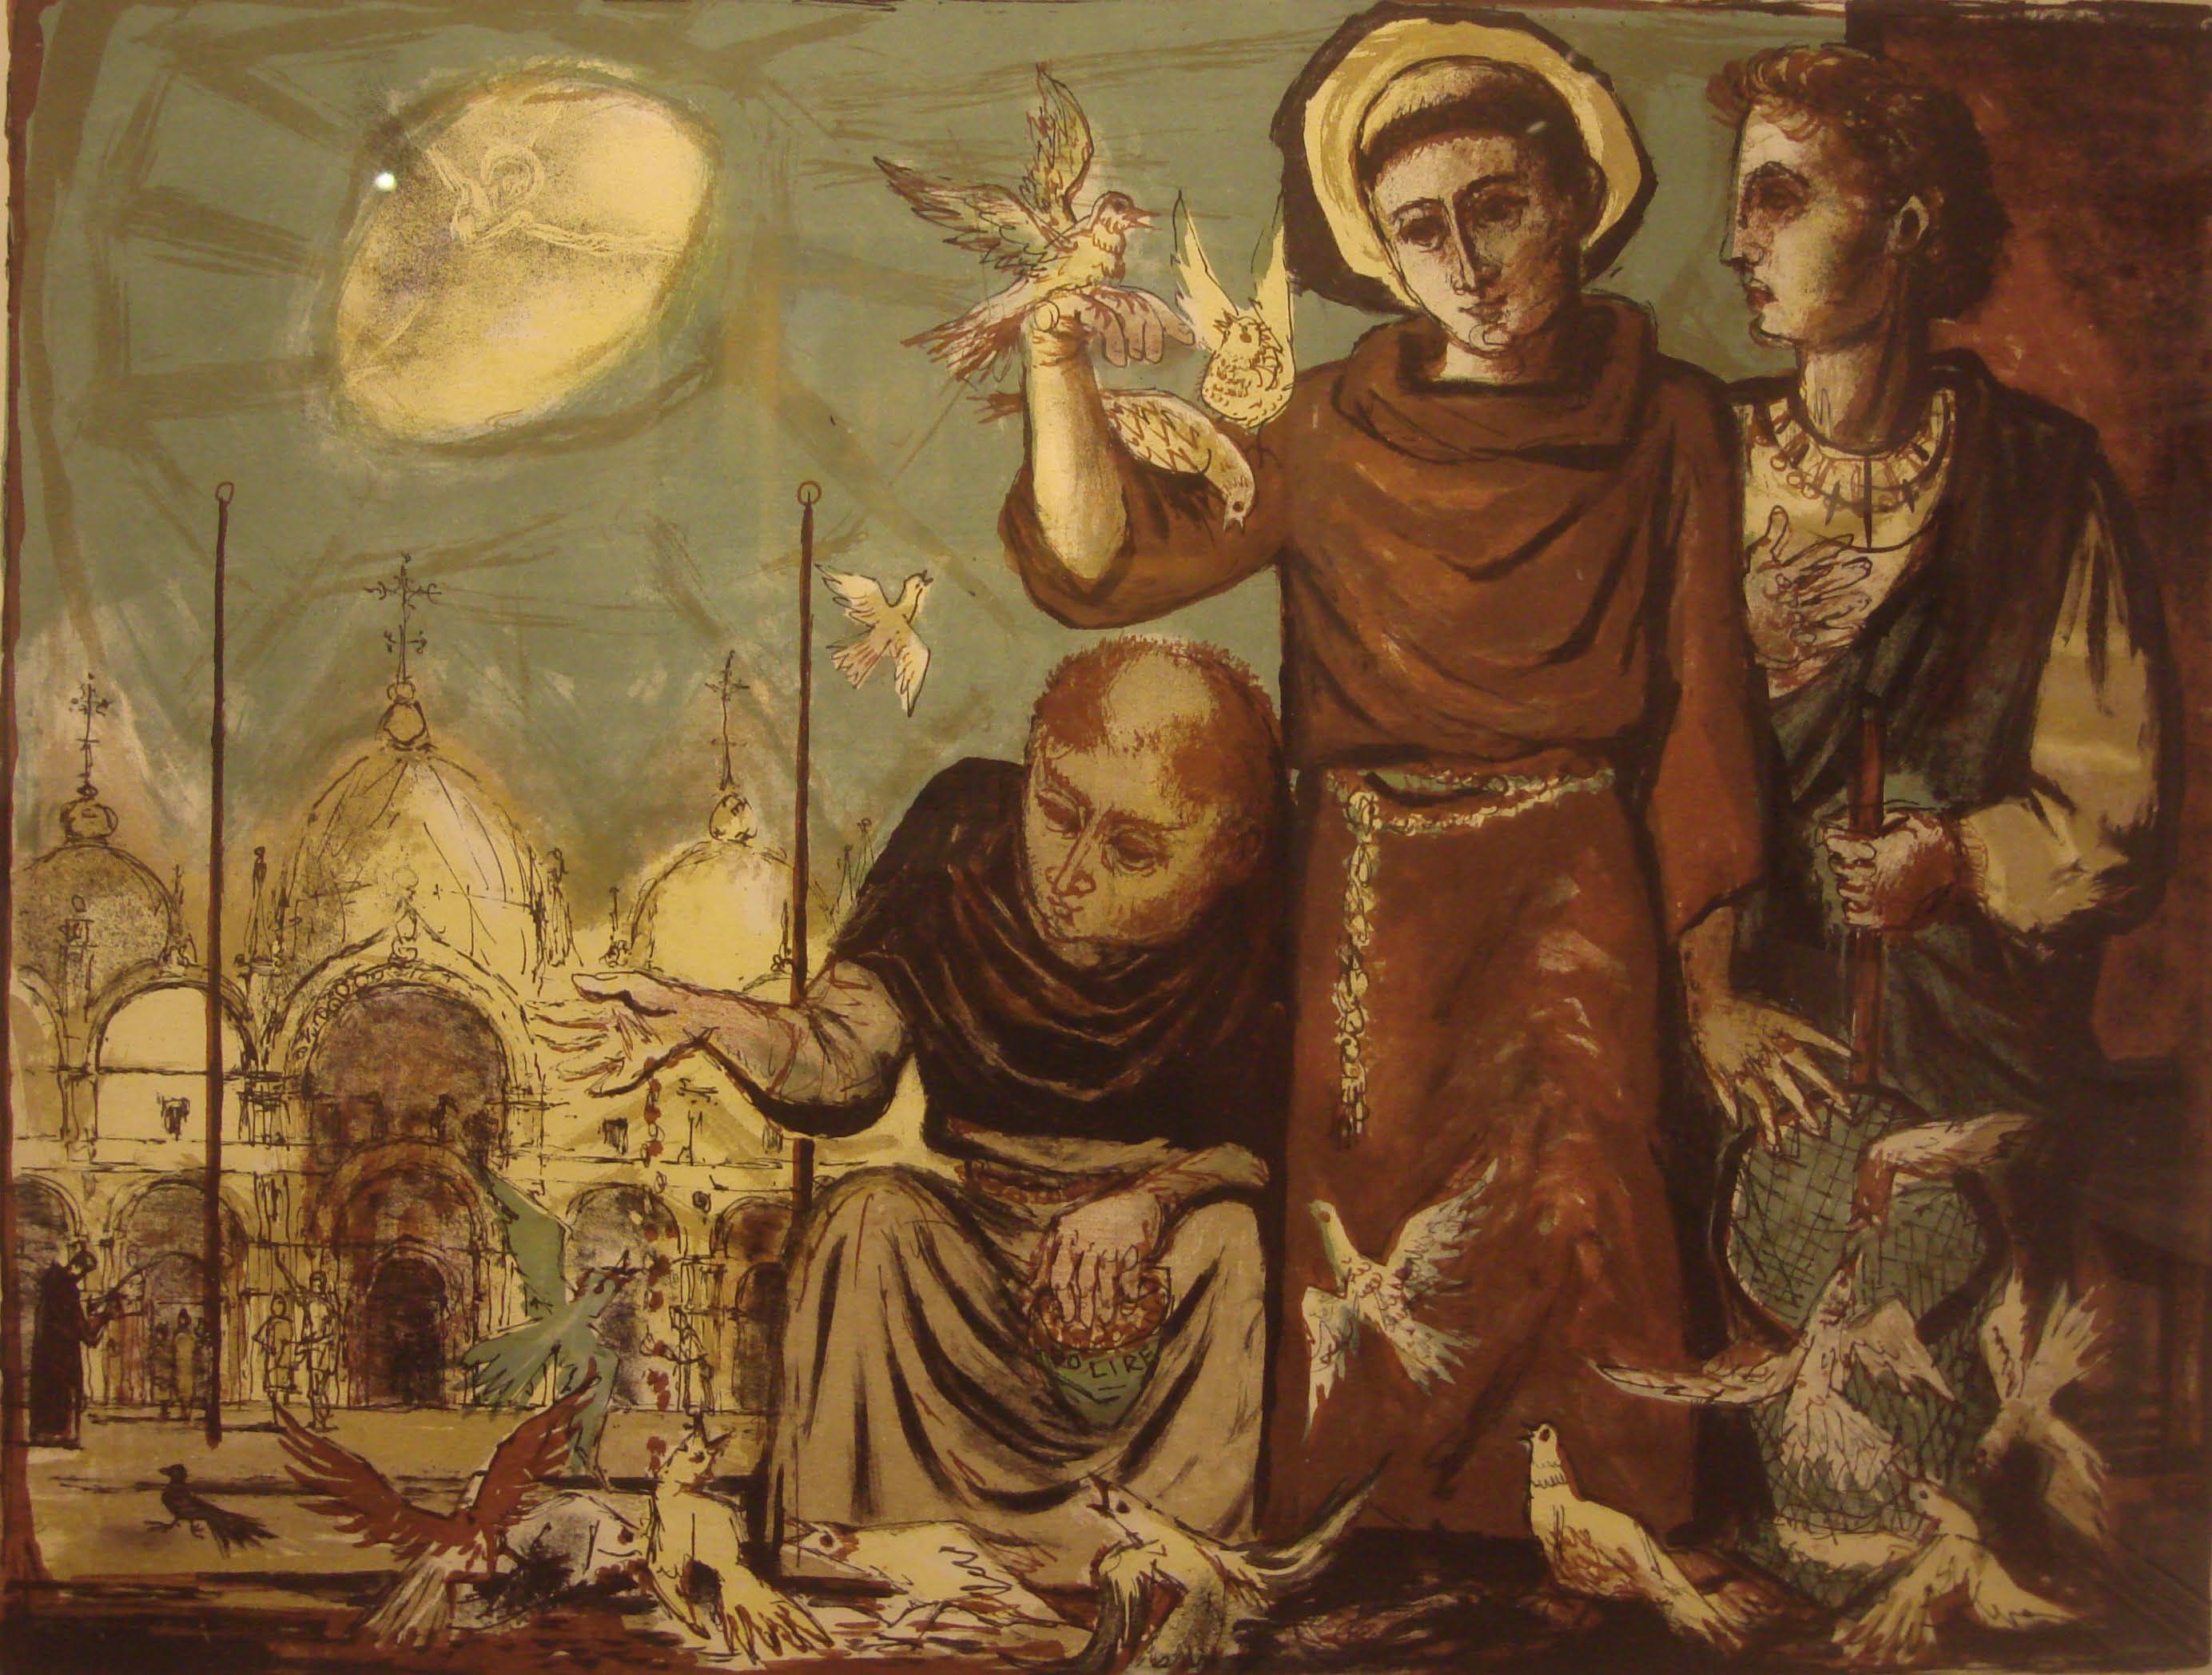 Habemus Papam St Francis Of Assisi Painted C 1500 Vin De Vie